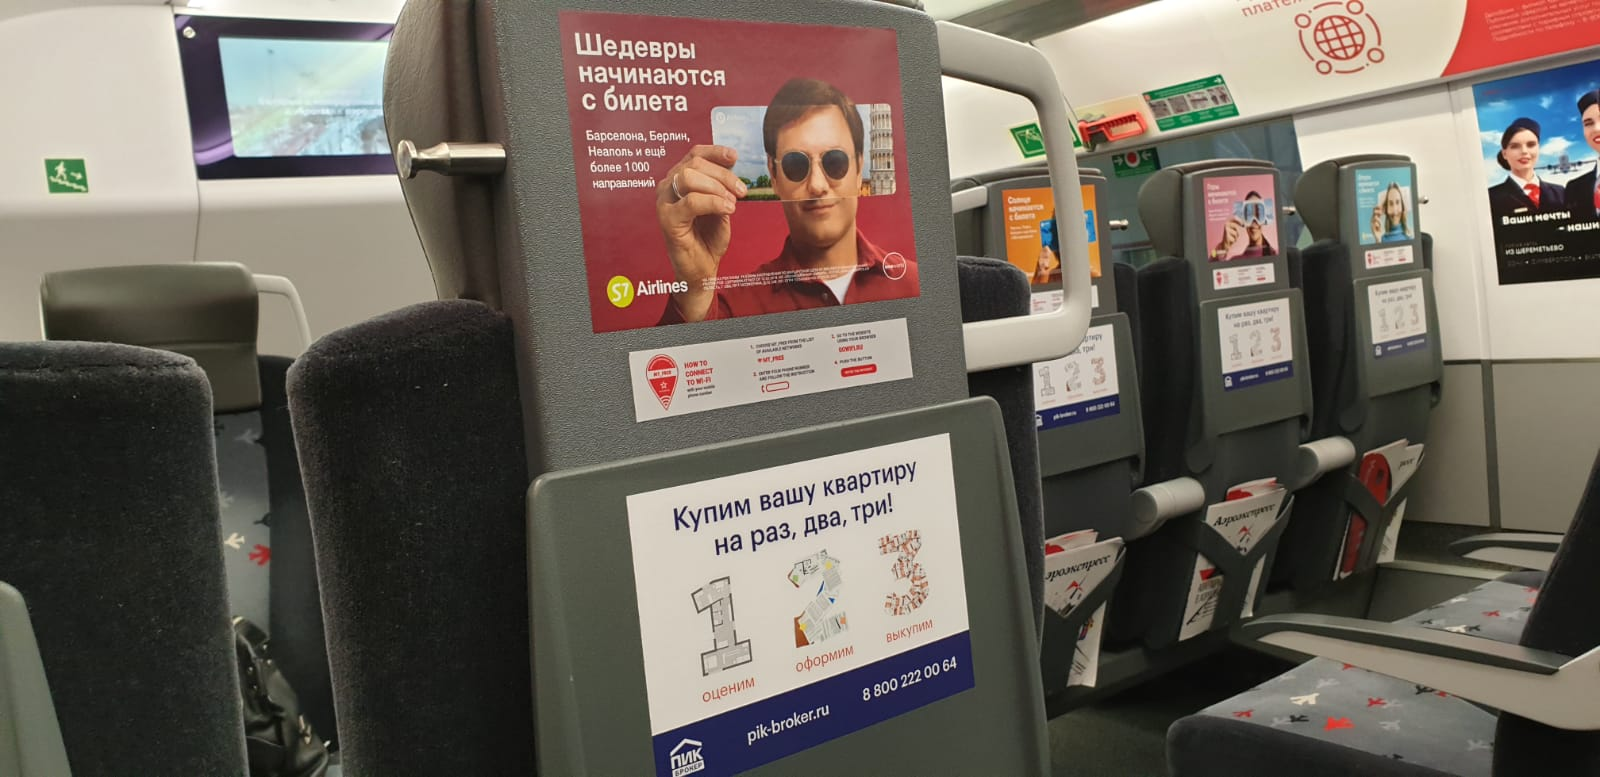 Aeroexpress Moskau, Moskau Reise